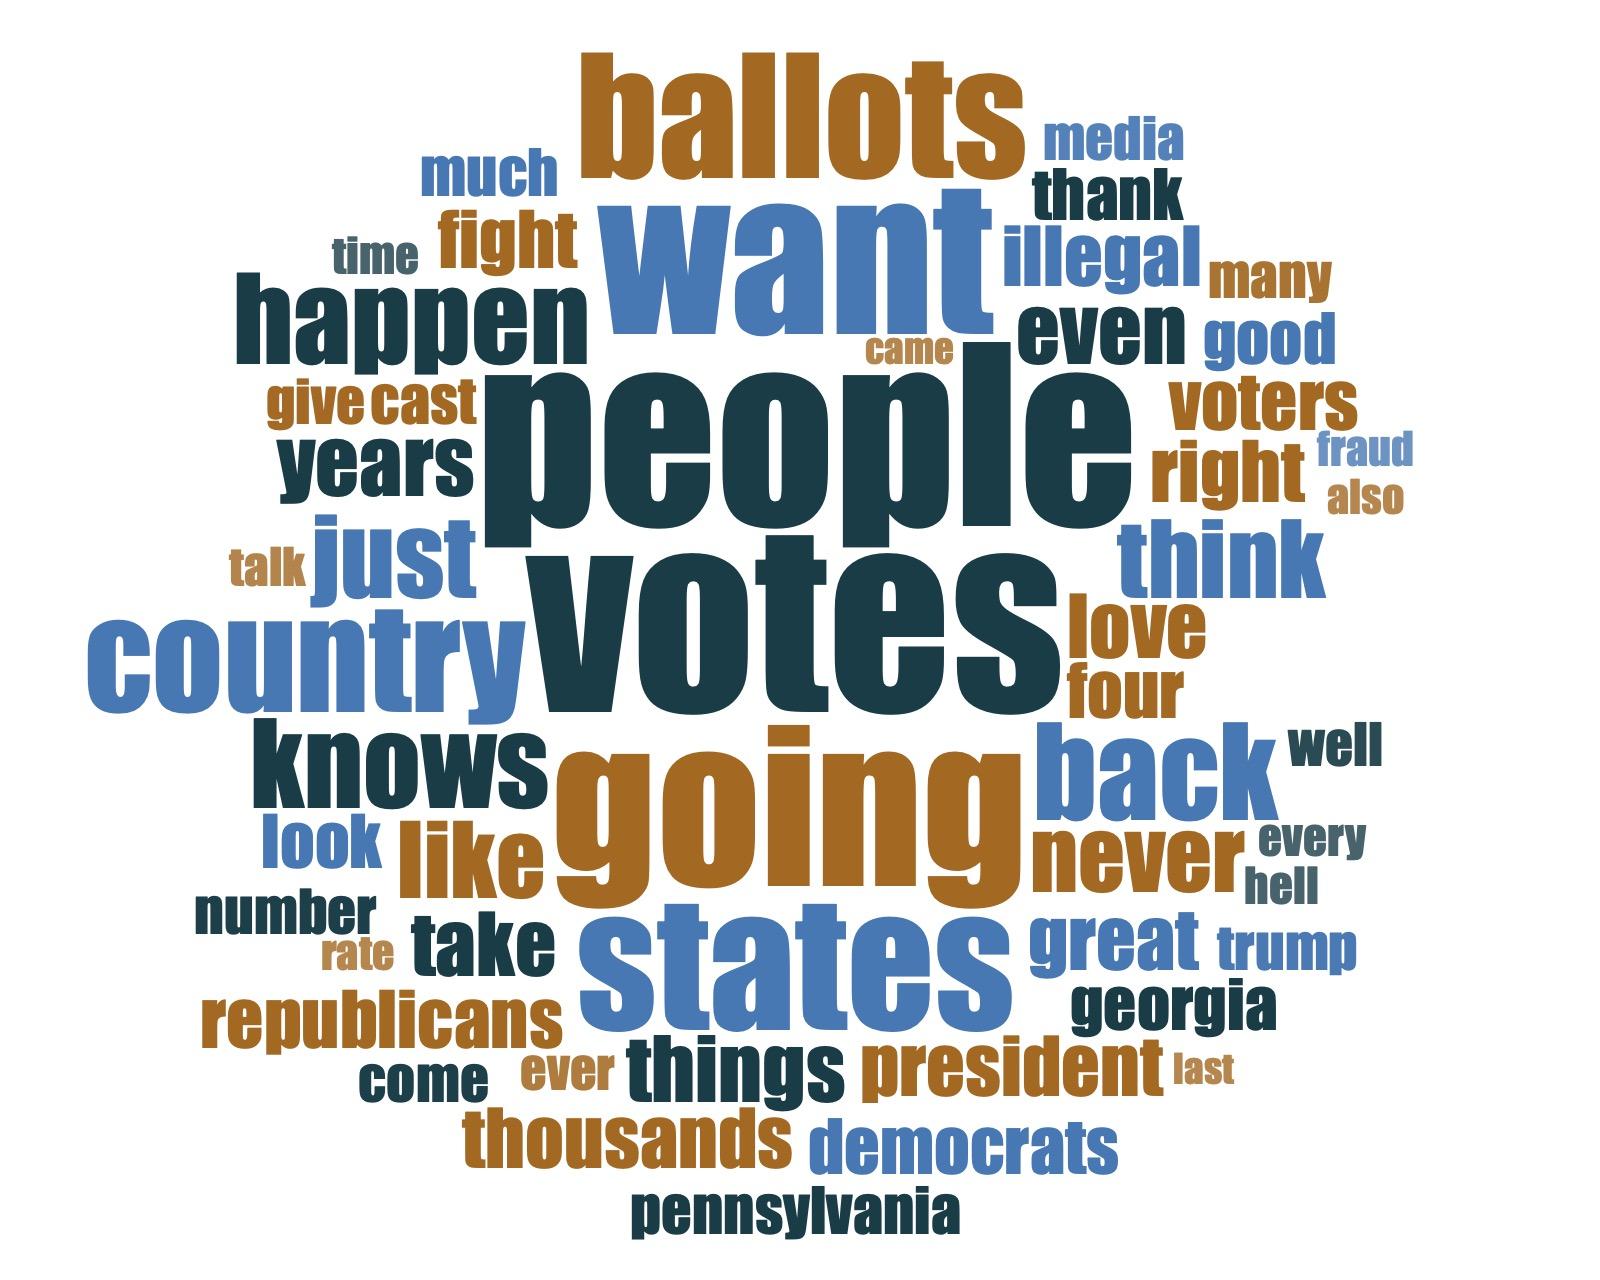 http://triple-c.at/public/journals/1/figure3_trump_riotspeech_wordcloud2.jpg